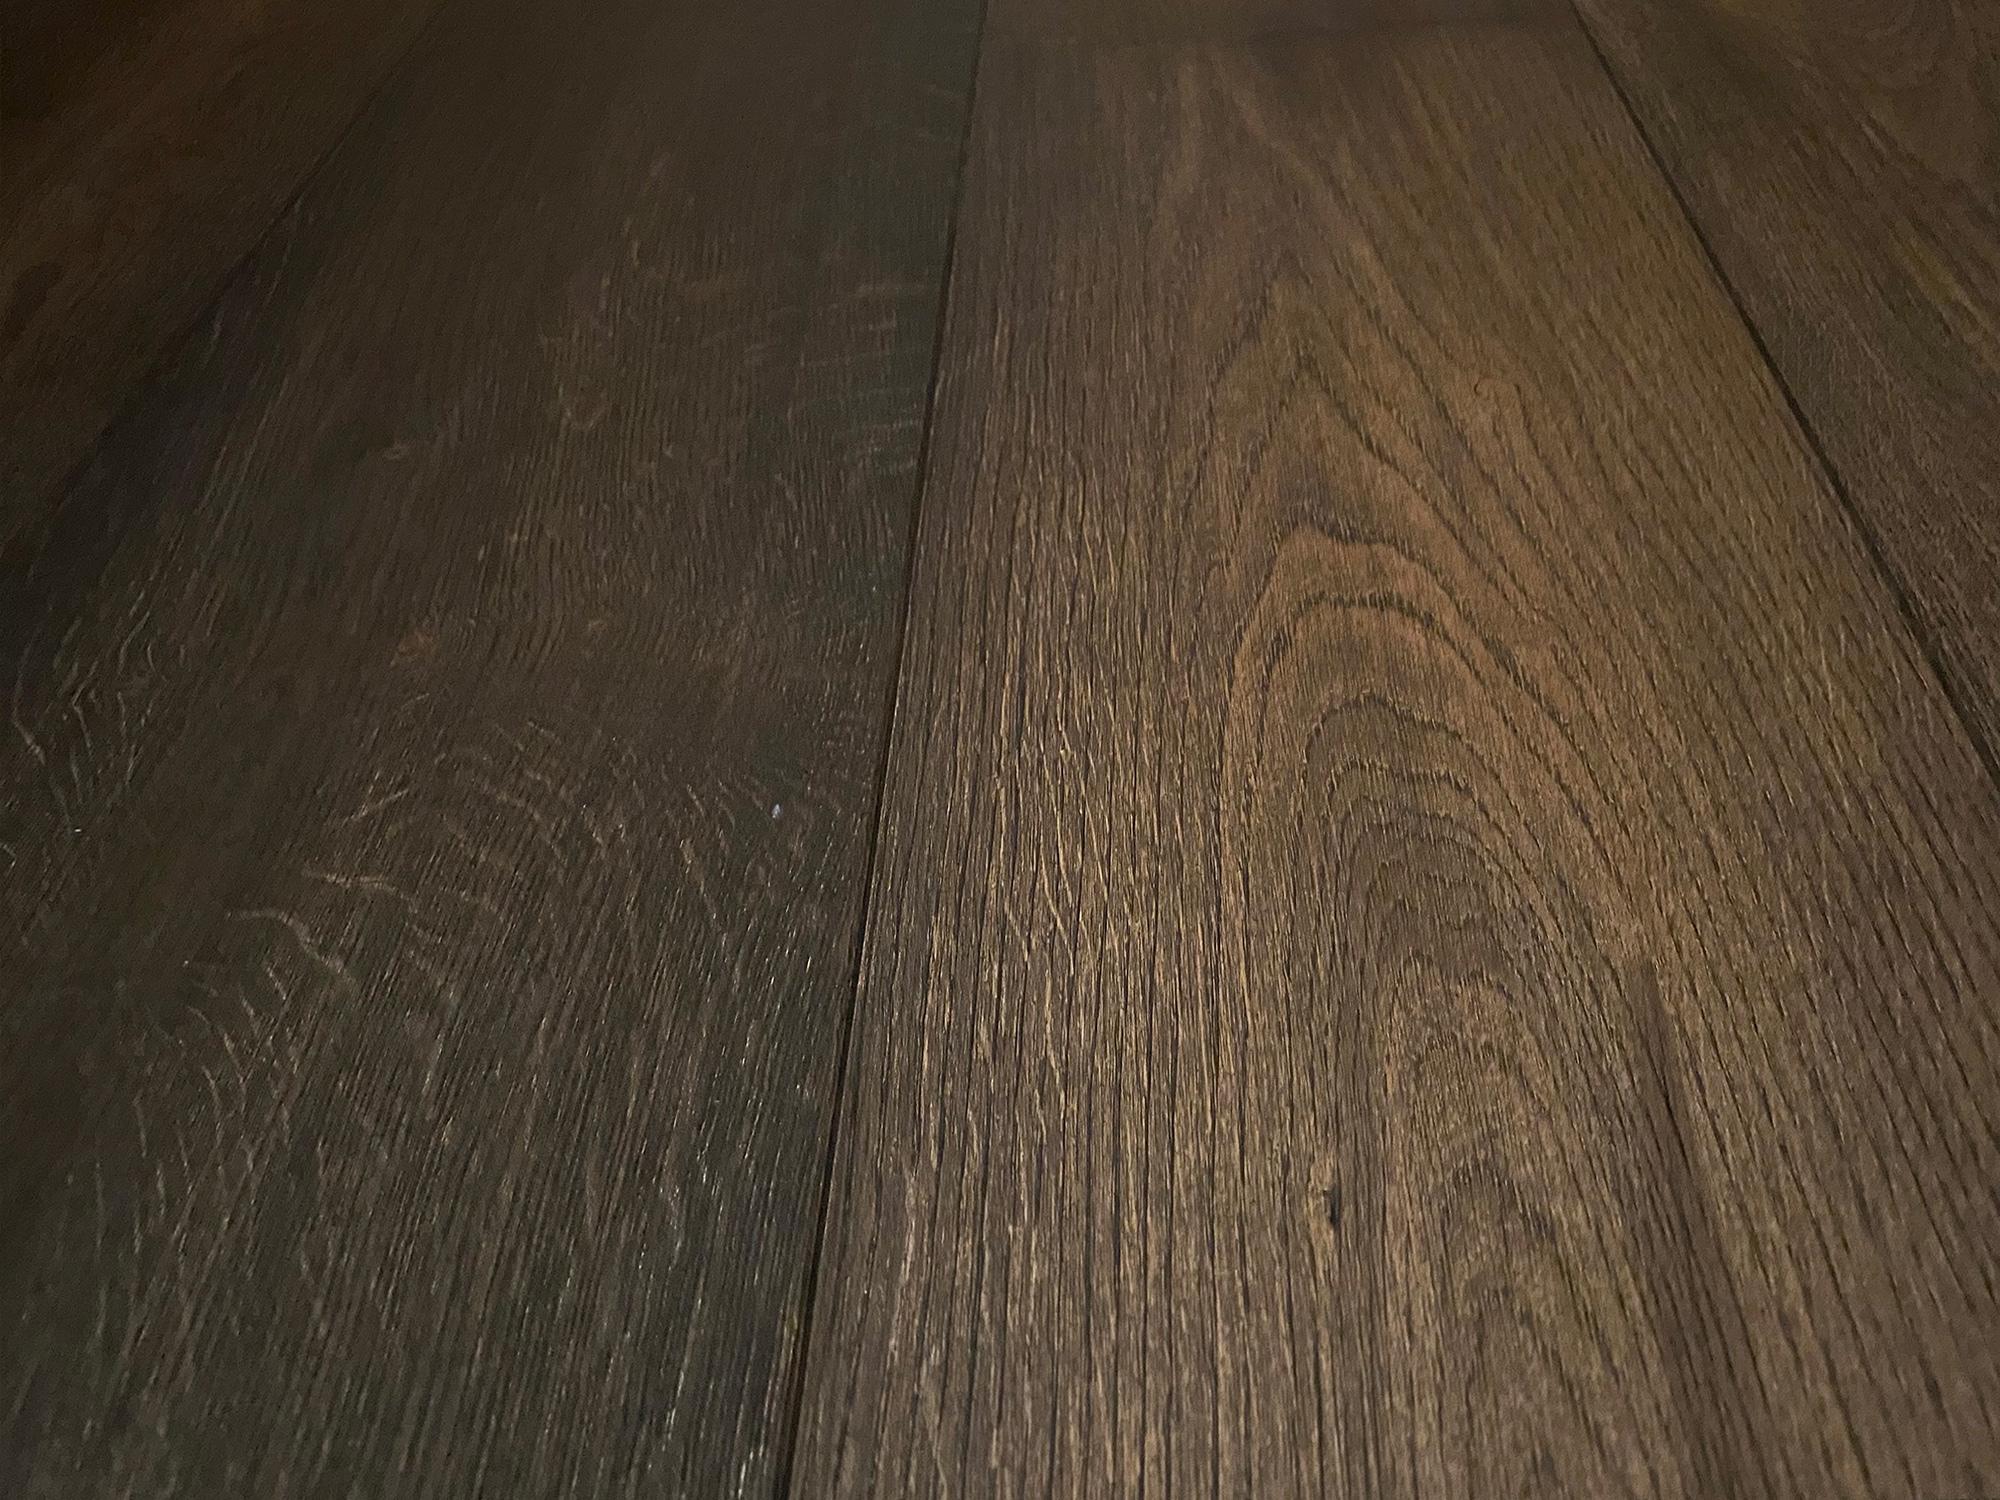 Dark brown floor board